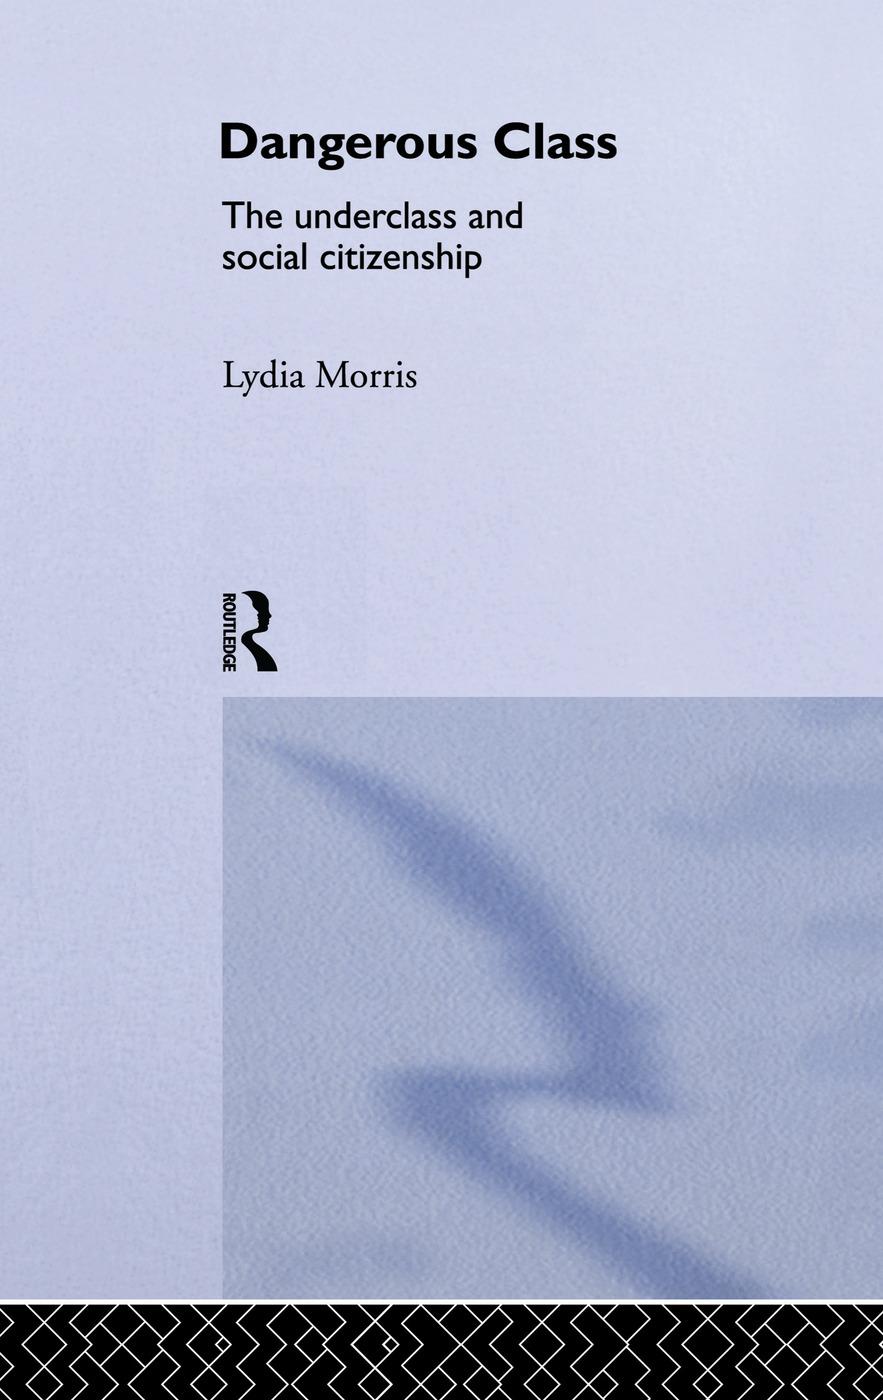 Dangerous Classes: The Underclass and Social Citizenship book cover